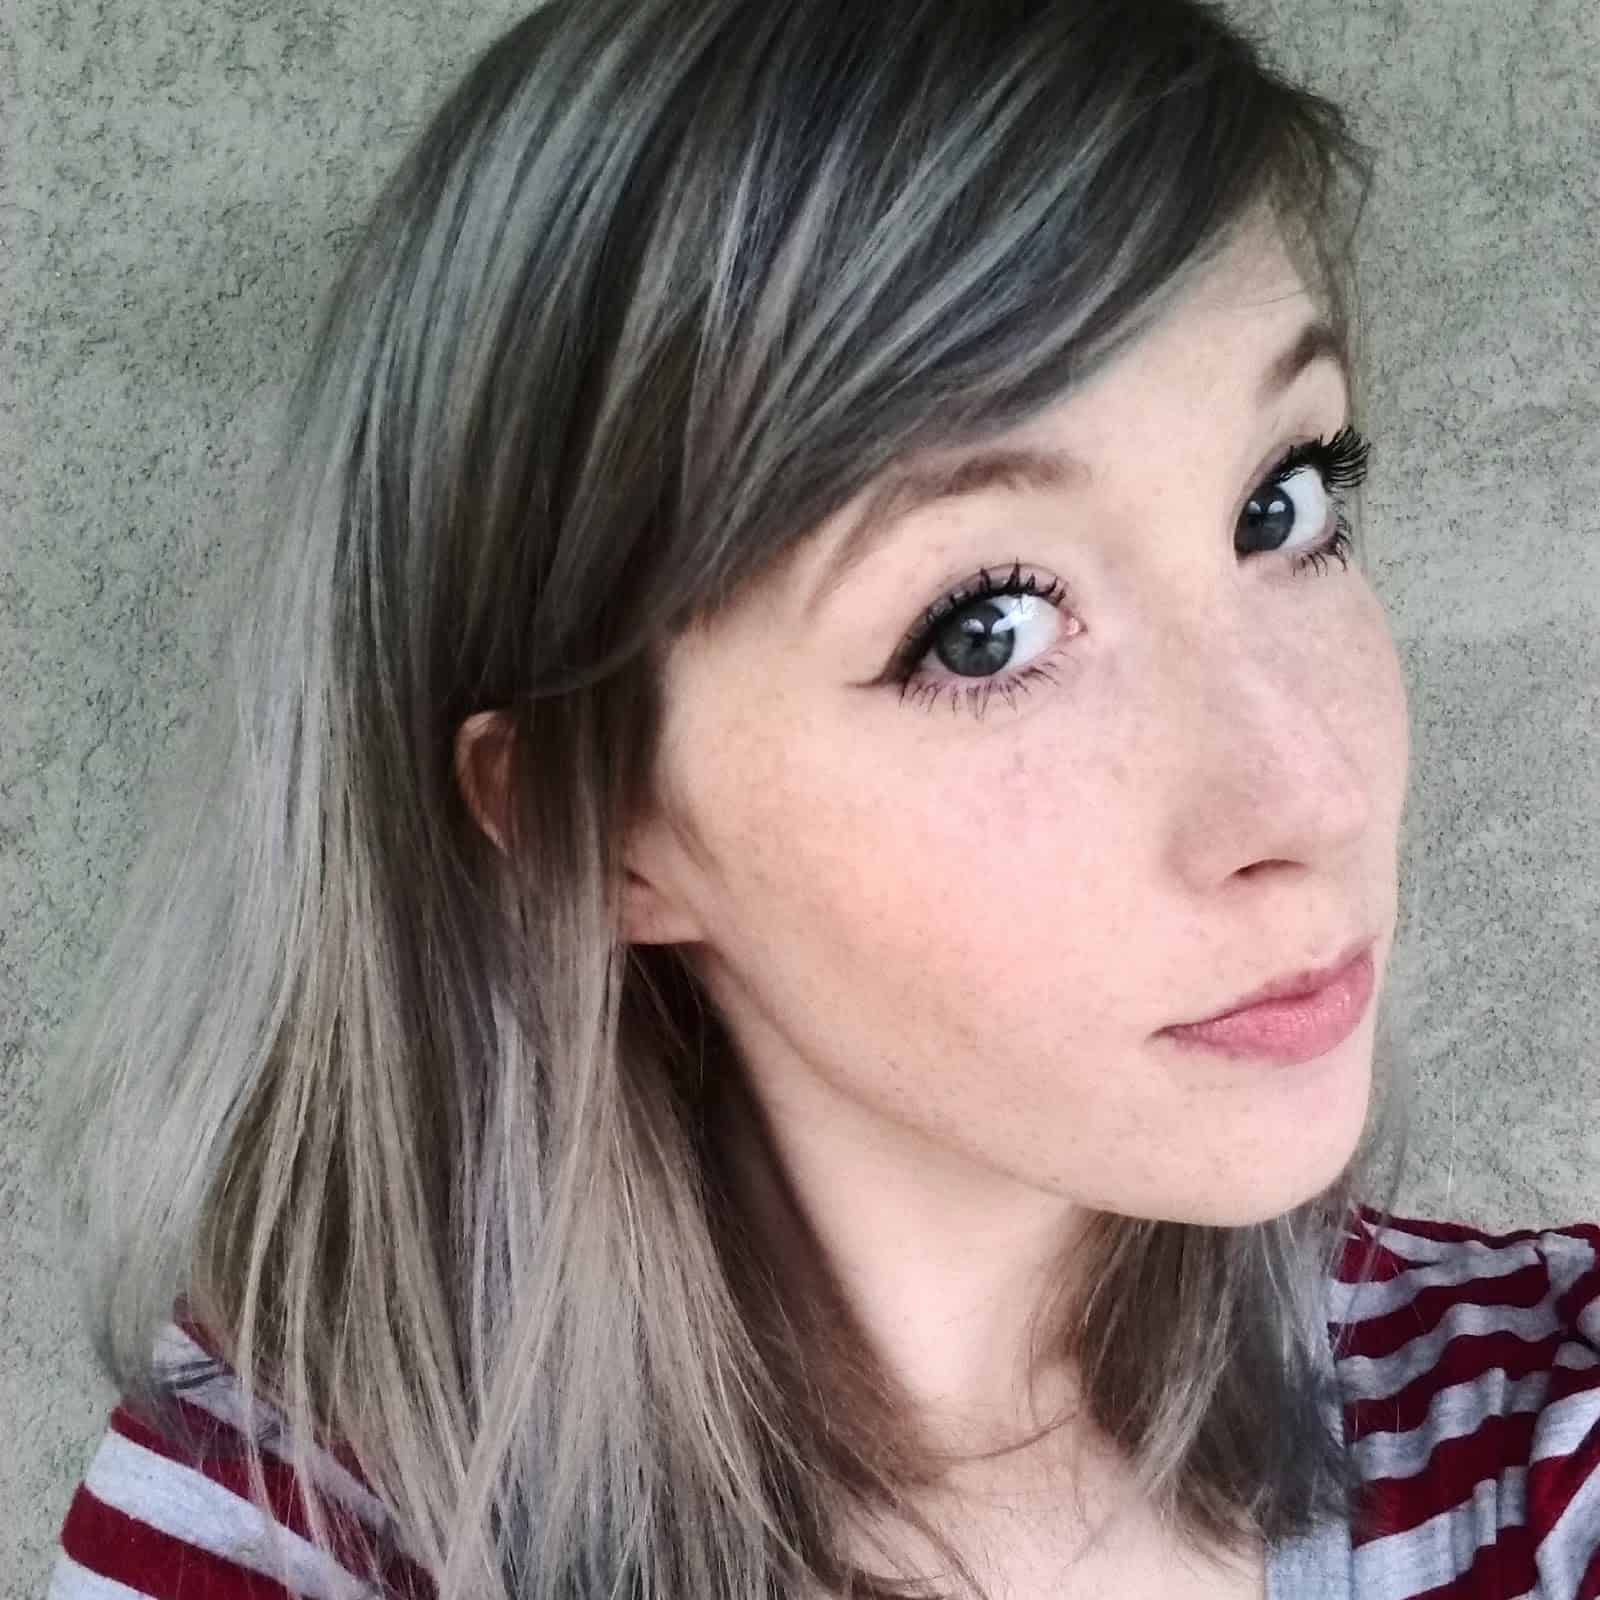 Salt & Pepper & Blonde – hair color